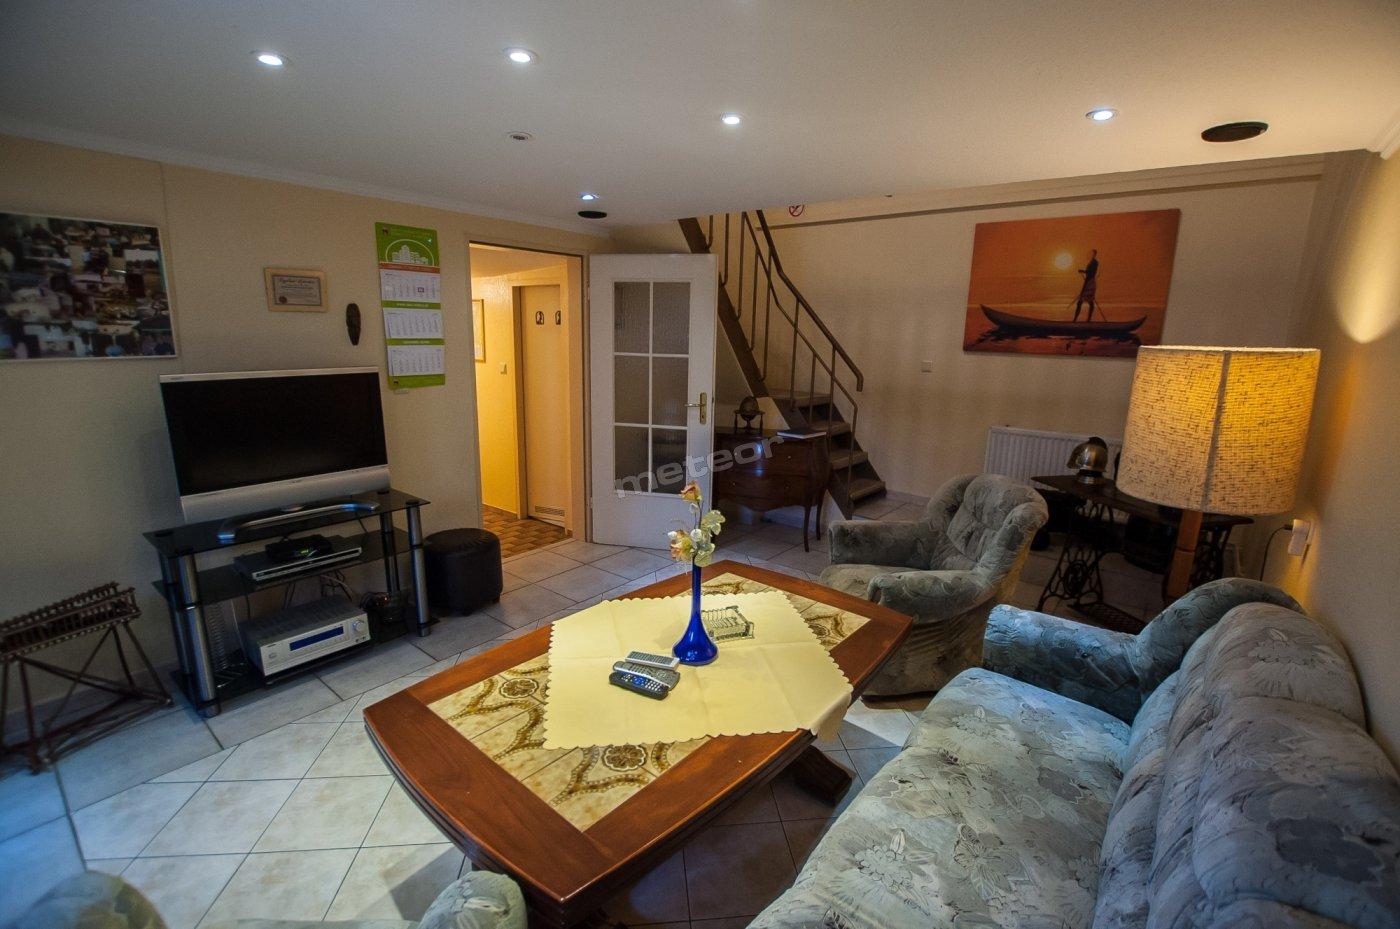 Apartament Nr.1 sześcioosobowy salon